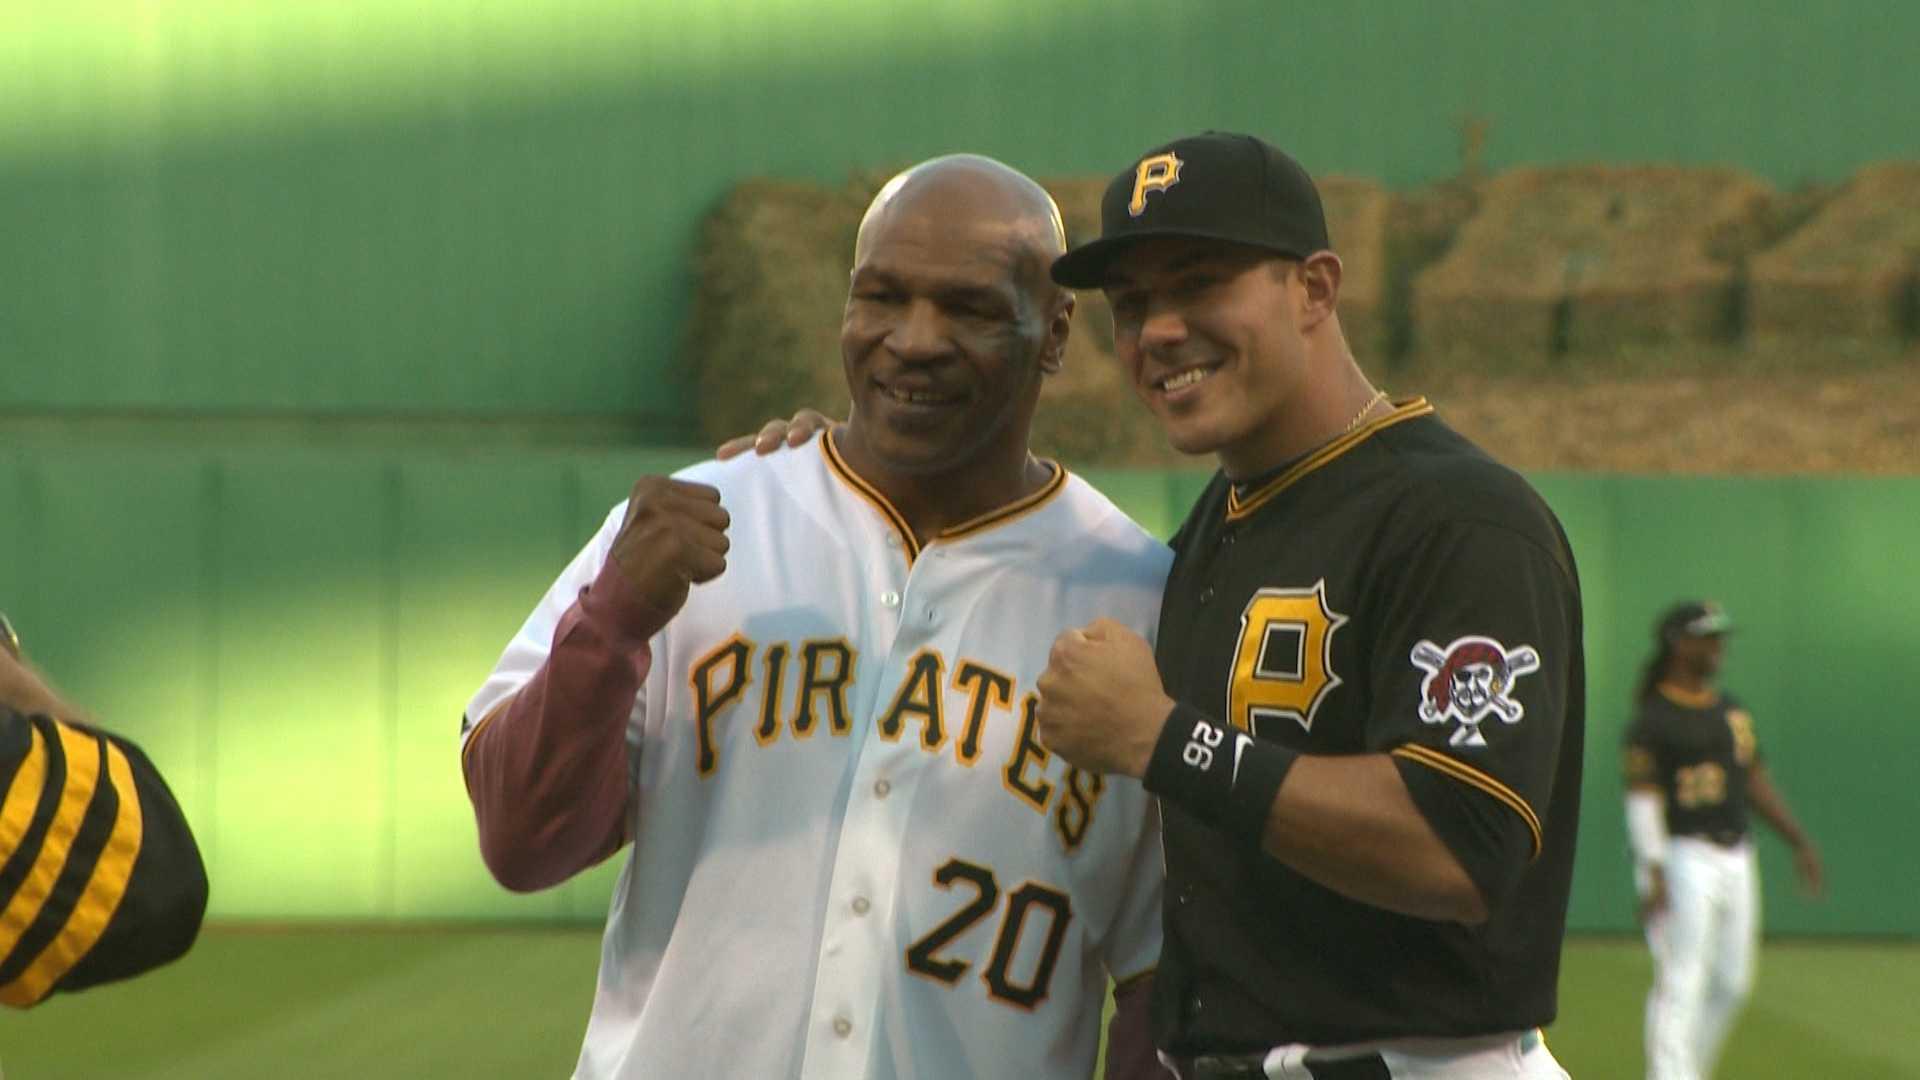 Tyson and Sanchez.jpg